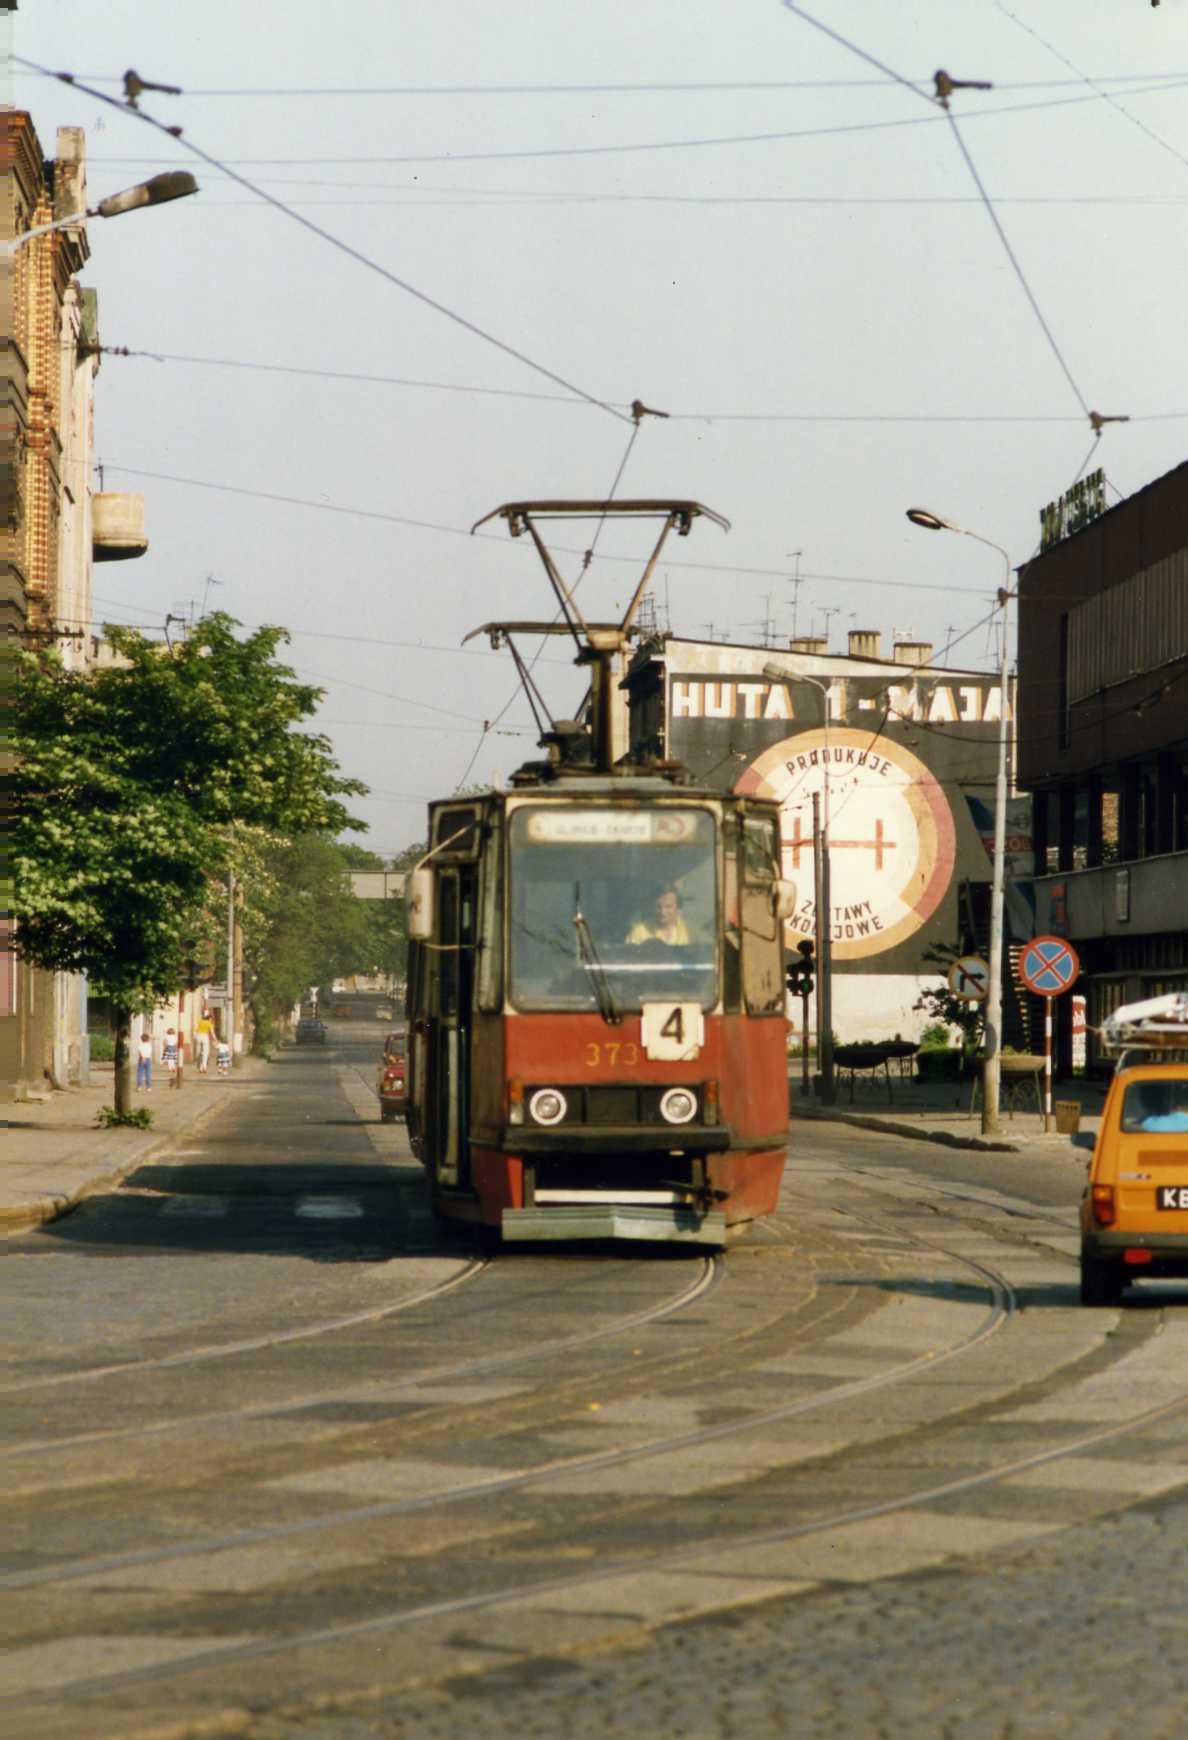 Gliwice Poland  city photos : Gliwice, Poland. Tramwaj w Gliwicach, Konstal nr 373, Linia 4 ...